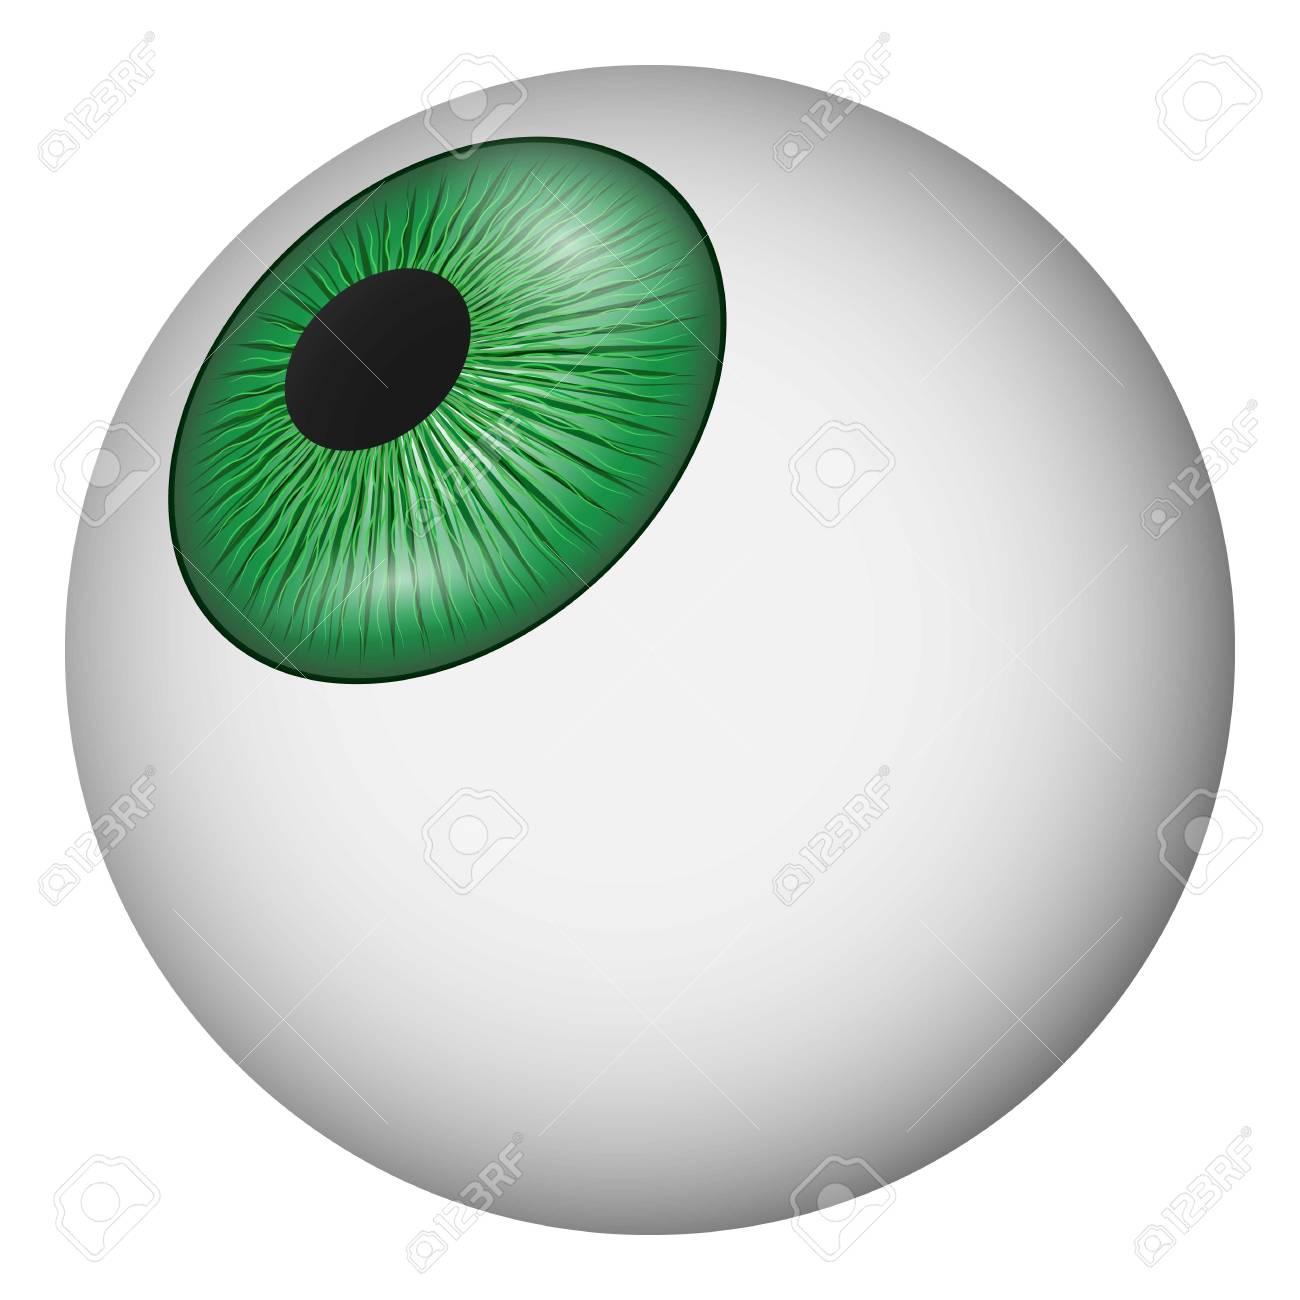 eyeball icon realistic illustration of eyeball vector icon for rh 123rf com eyeball vector free download eyeball vector png